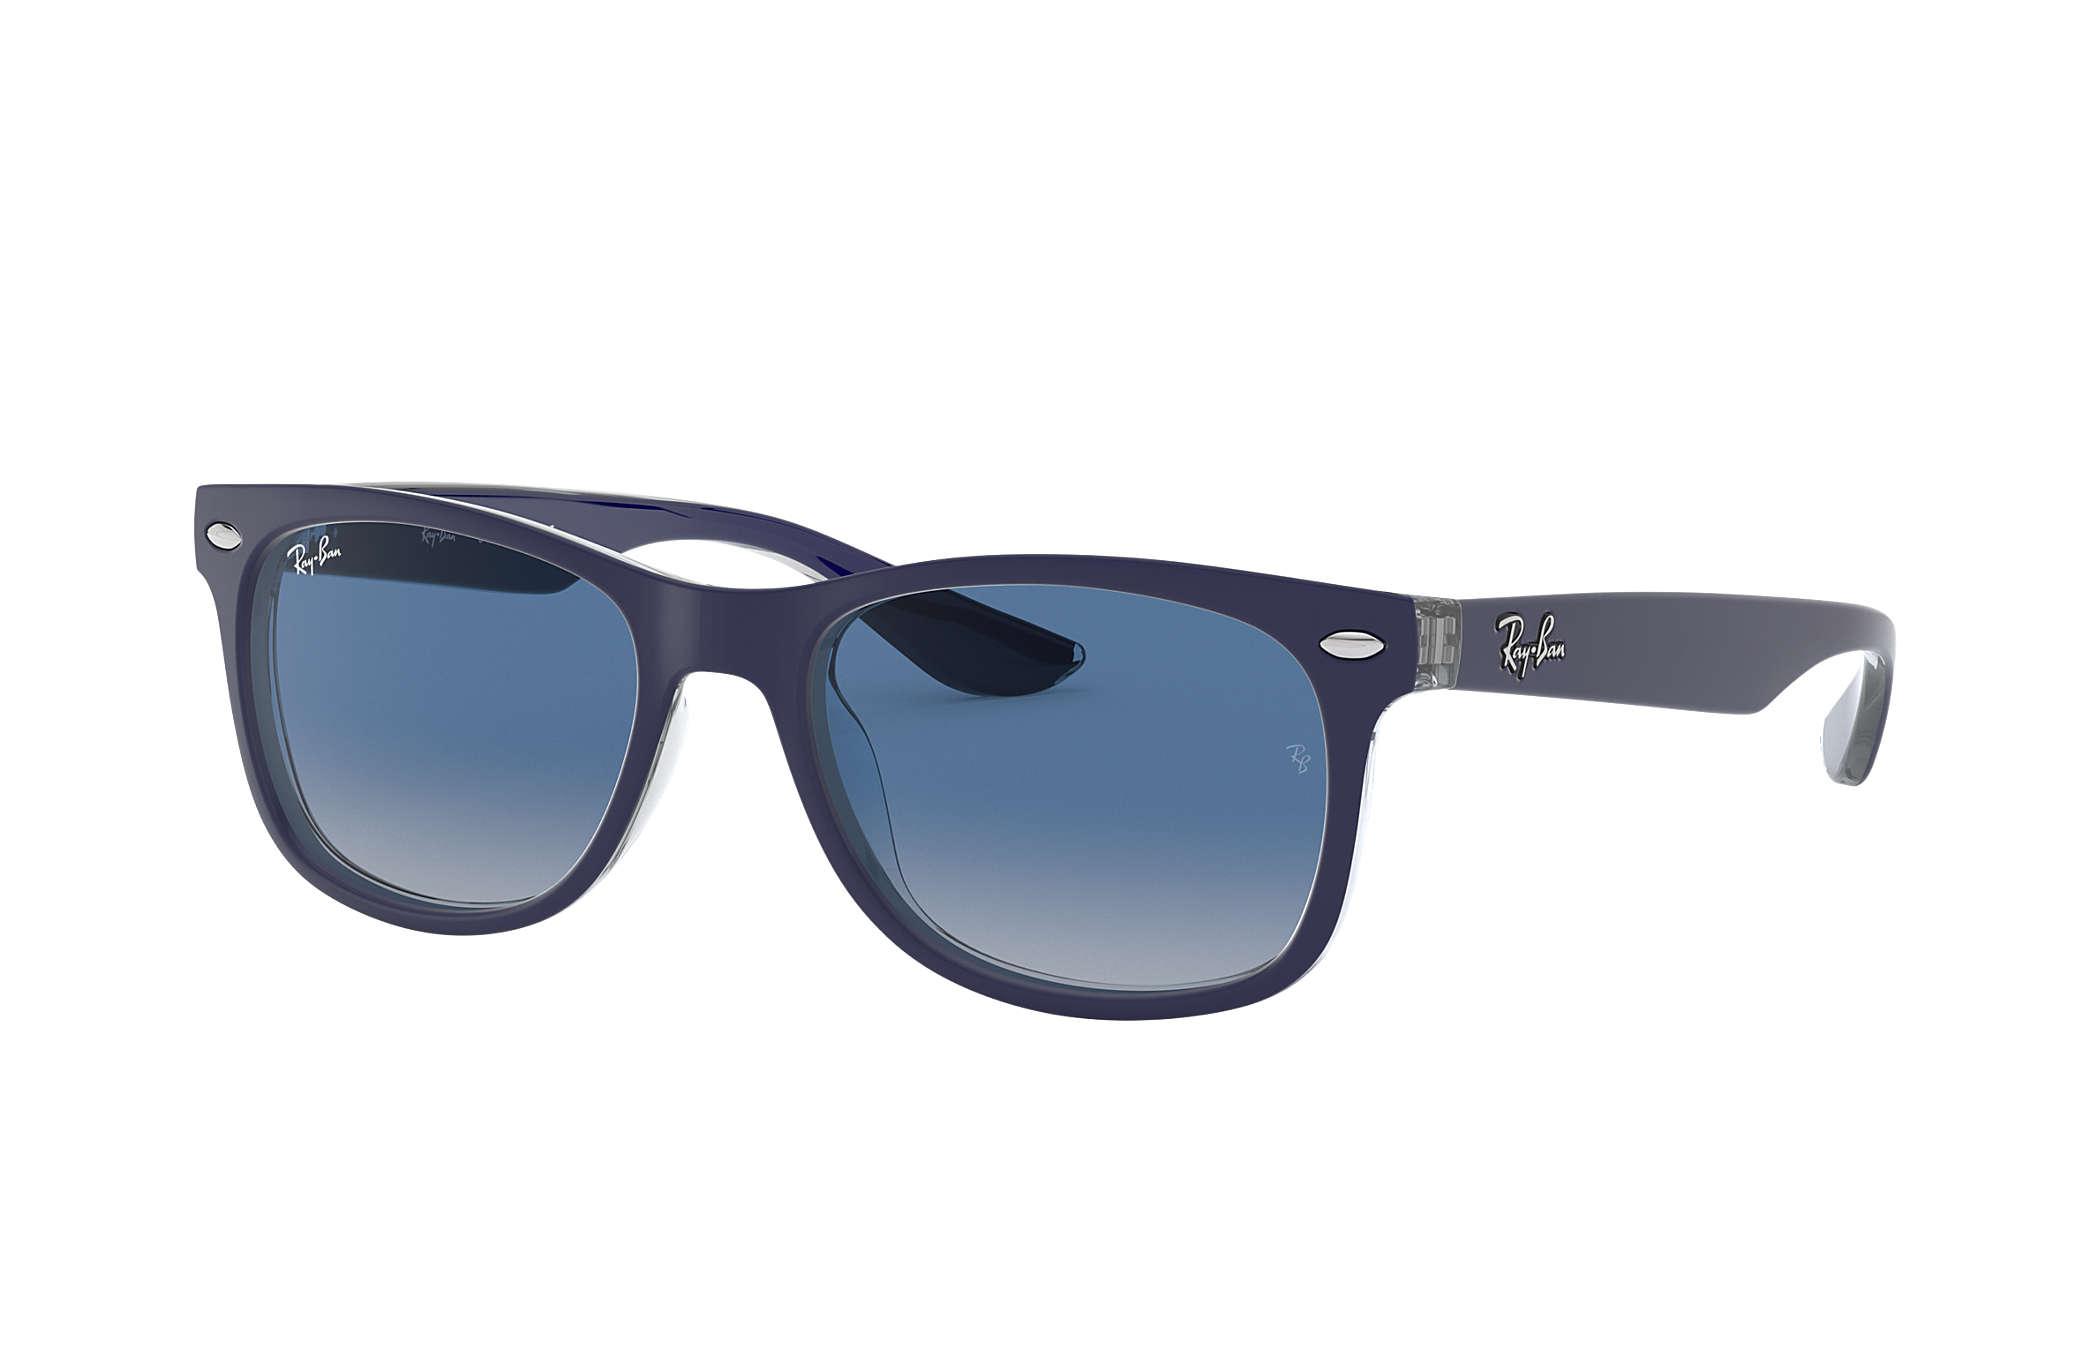 6a2cf32adfa Ray-Ban New Wayfarer Junior RB9052S Blue - Injected - Blue Lenses ...